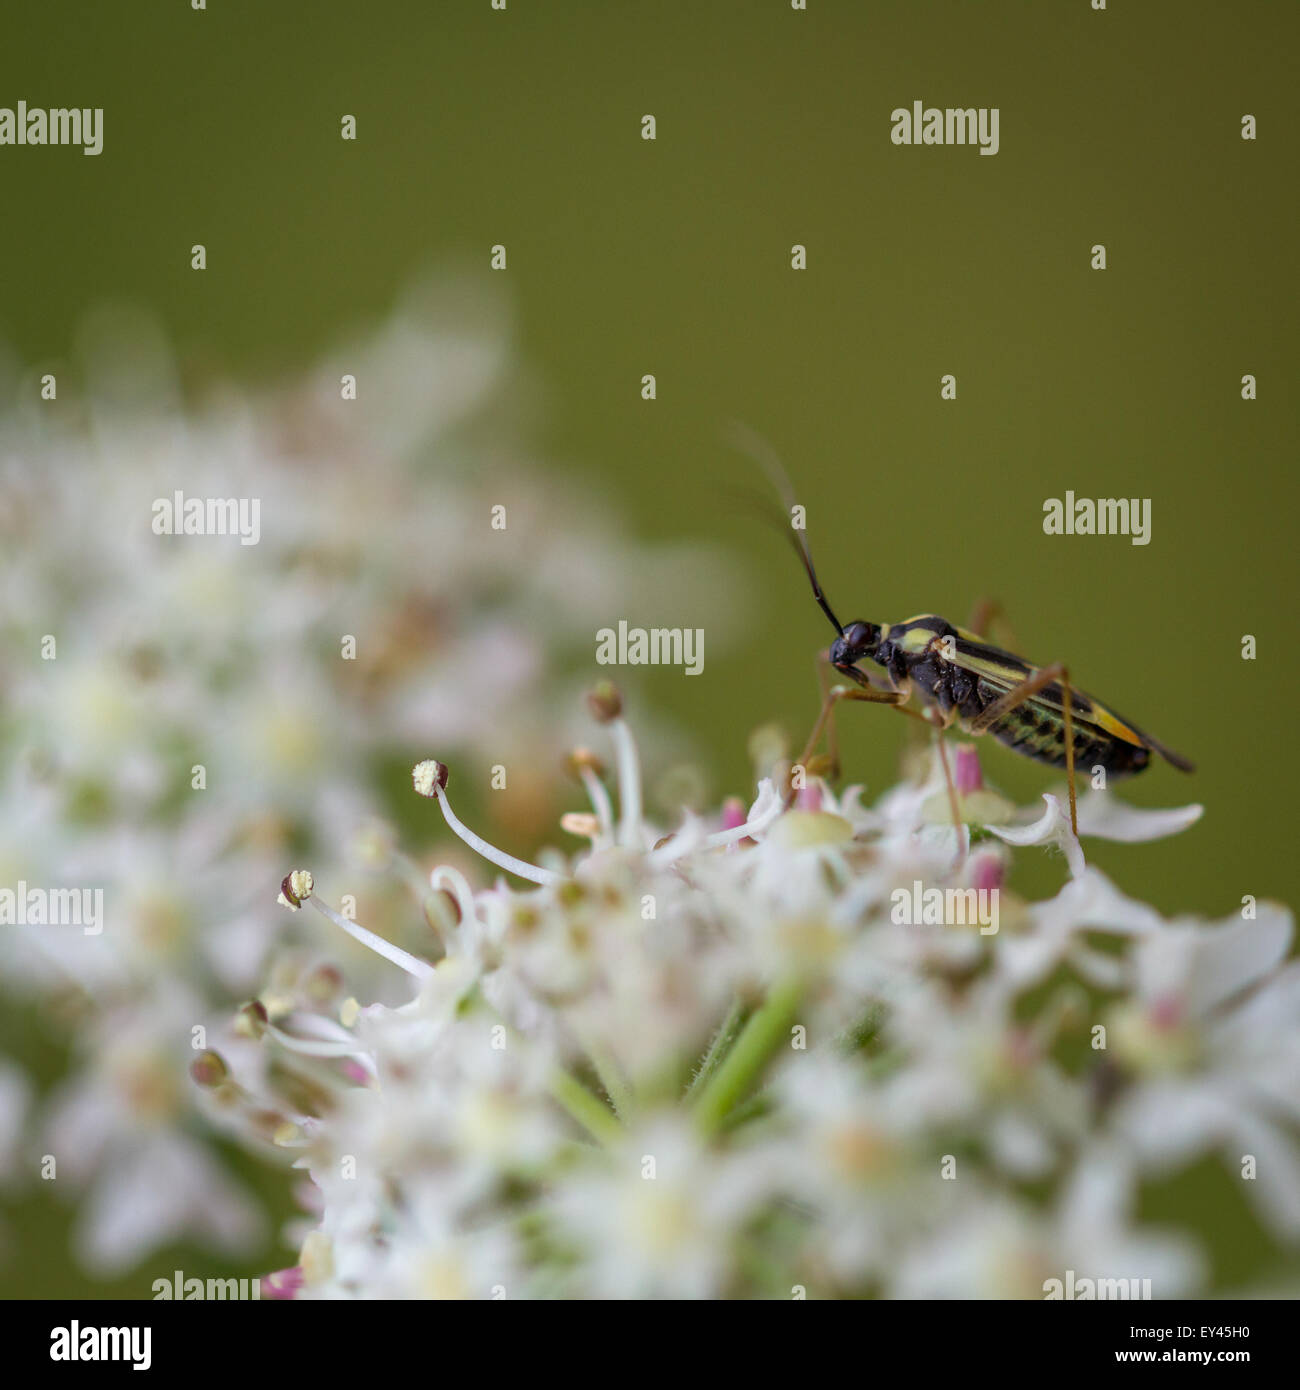 Grypocoris (Lophyromiris) stysi drinking nectar from hogweed, Yorkshire, UK - Stock Image